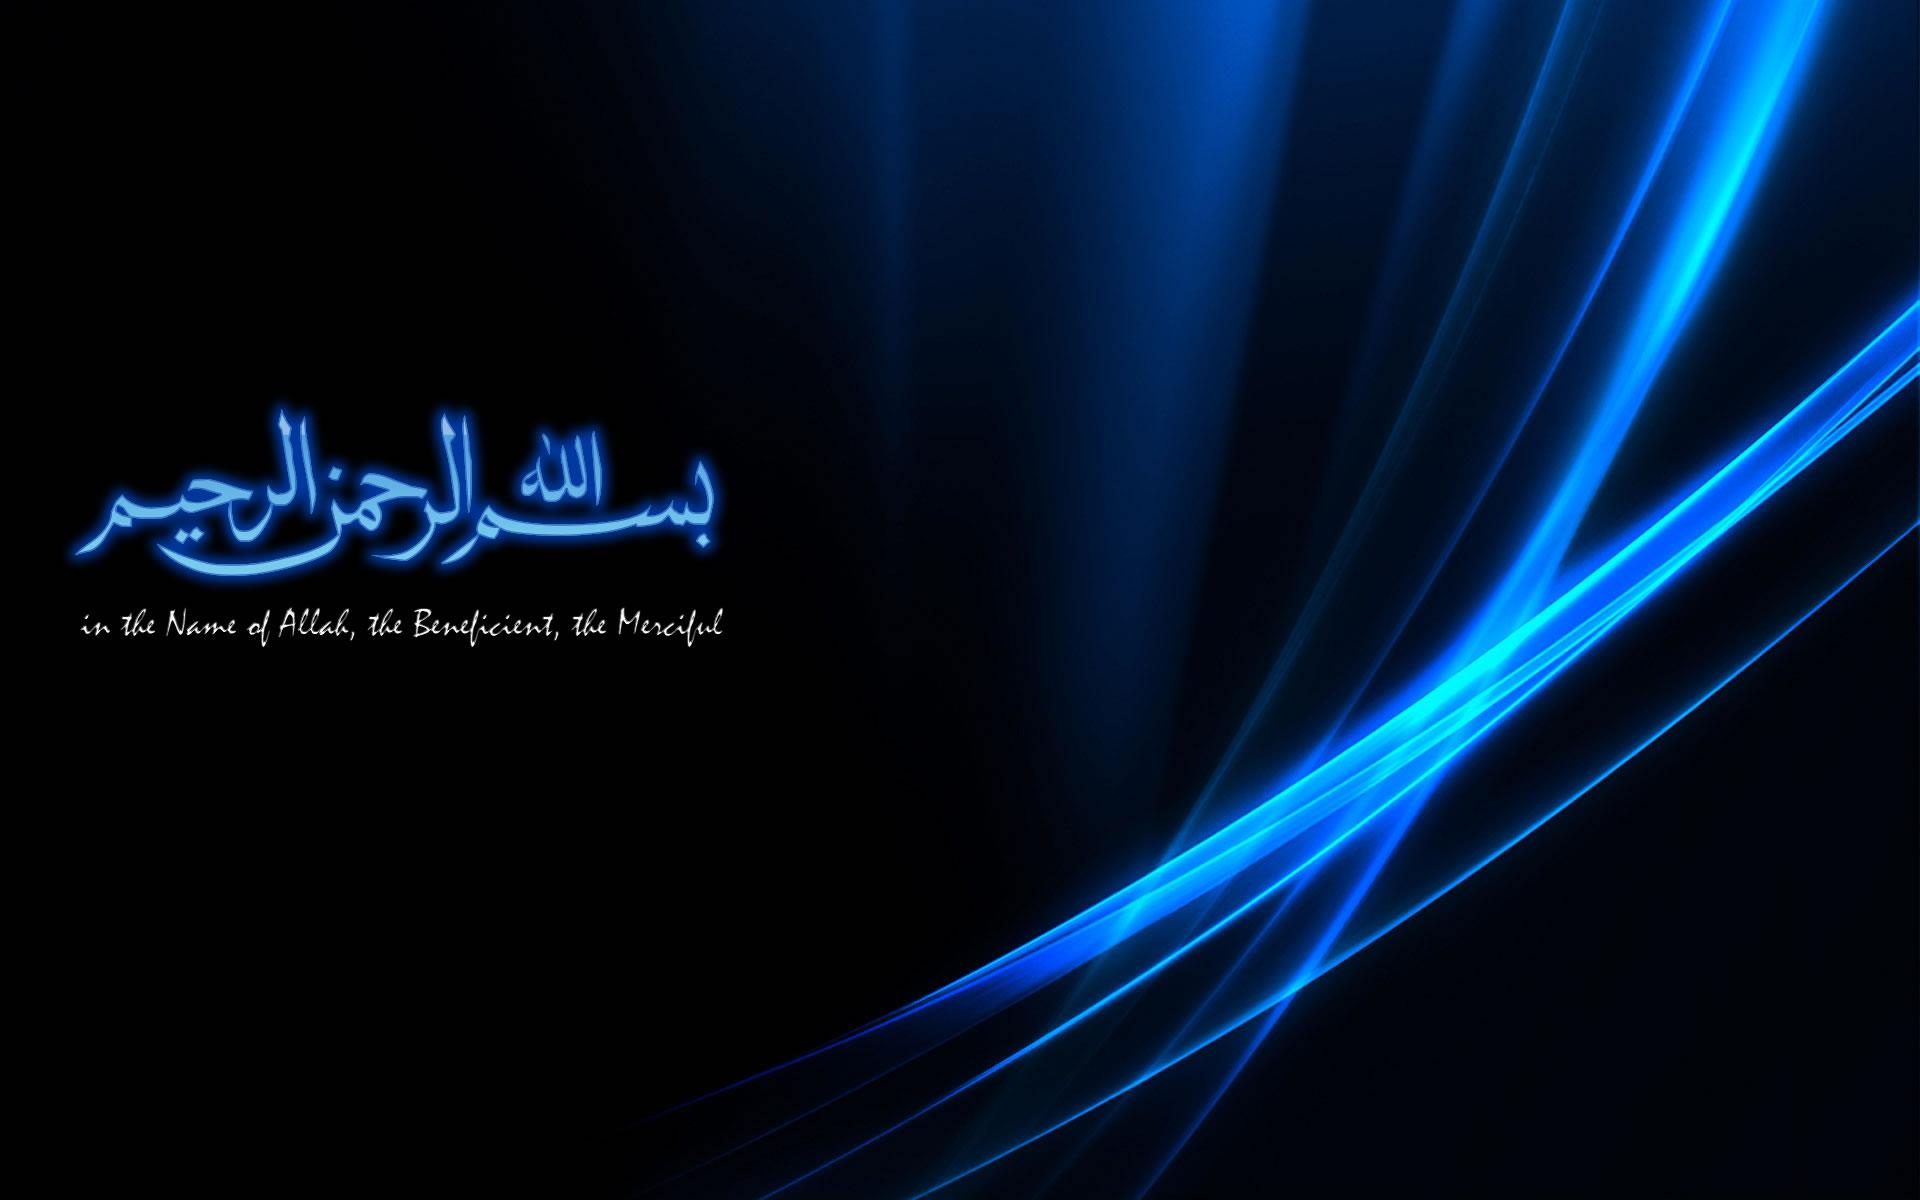 Islamic Wallpaper Web: Islamic Art Wallpaper